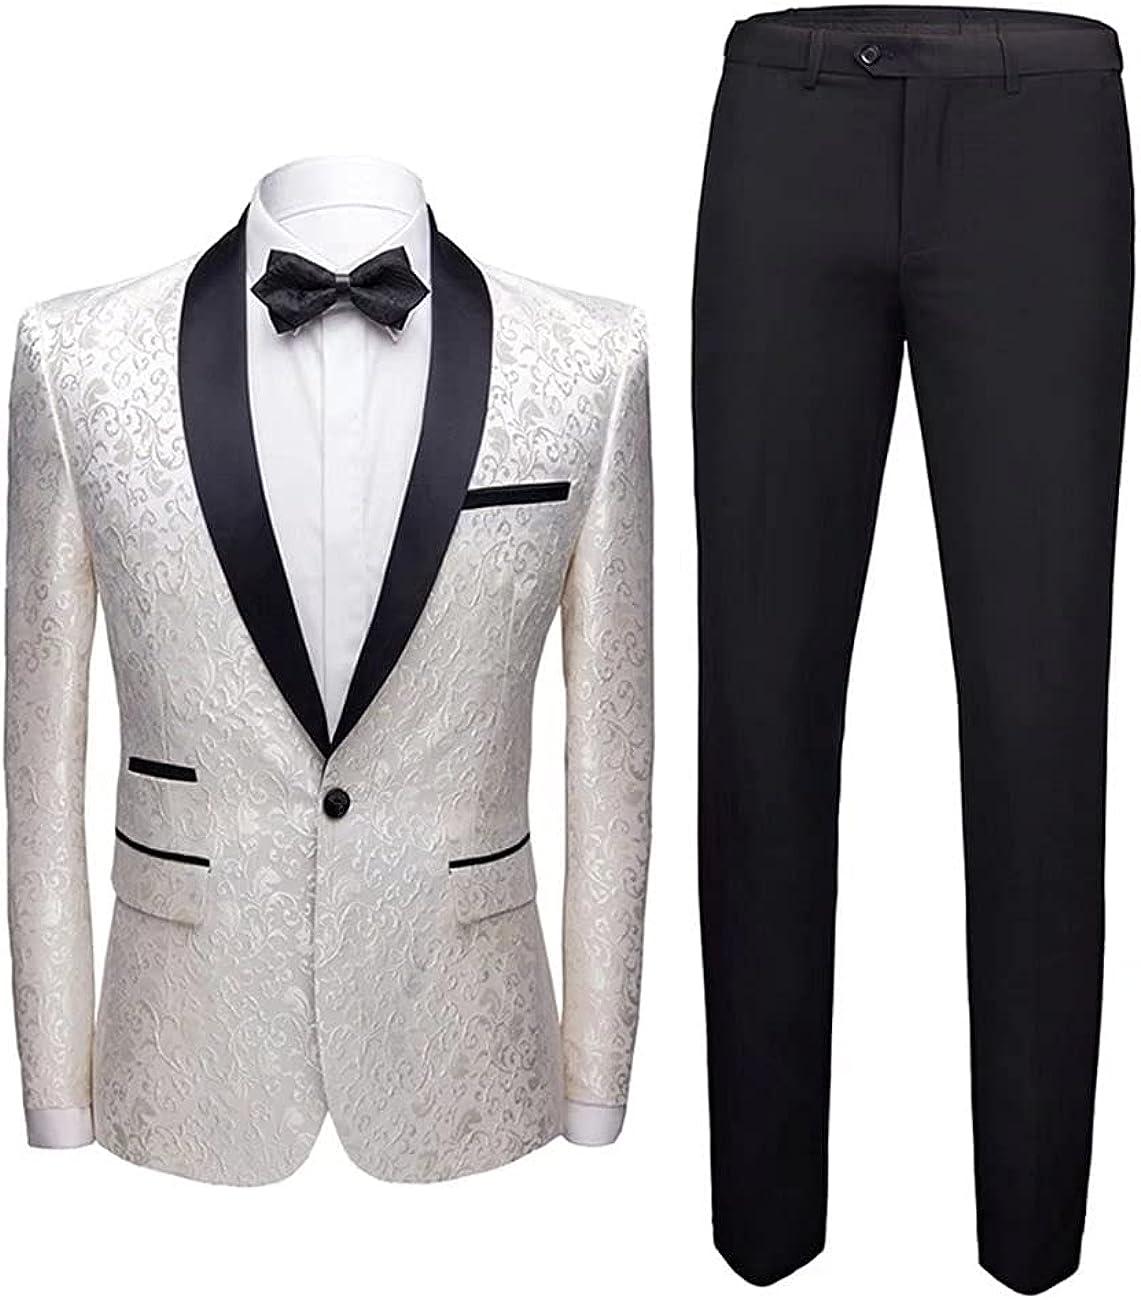 Wangyue Men's 2 Piece Suit Set Slim Fit Floral Jacquard Printed Single Breasted Tuxedo Blazer Jacket+Pants